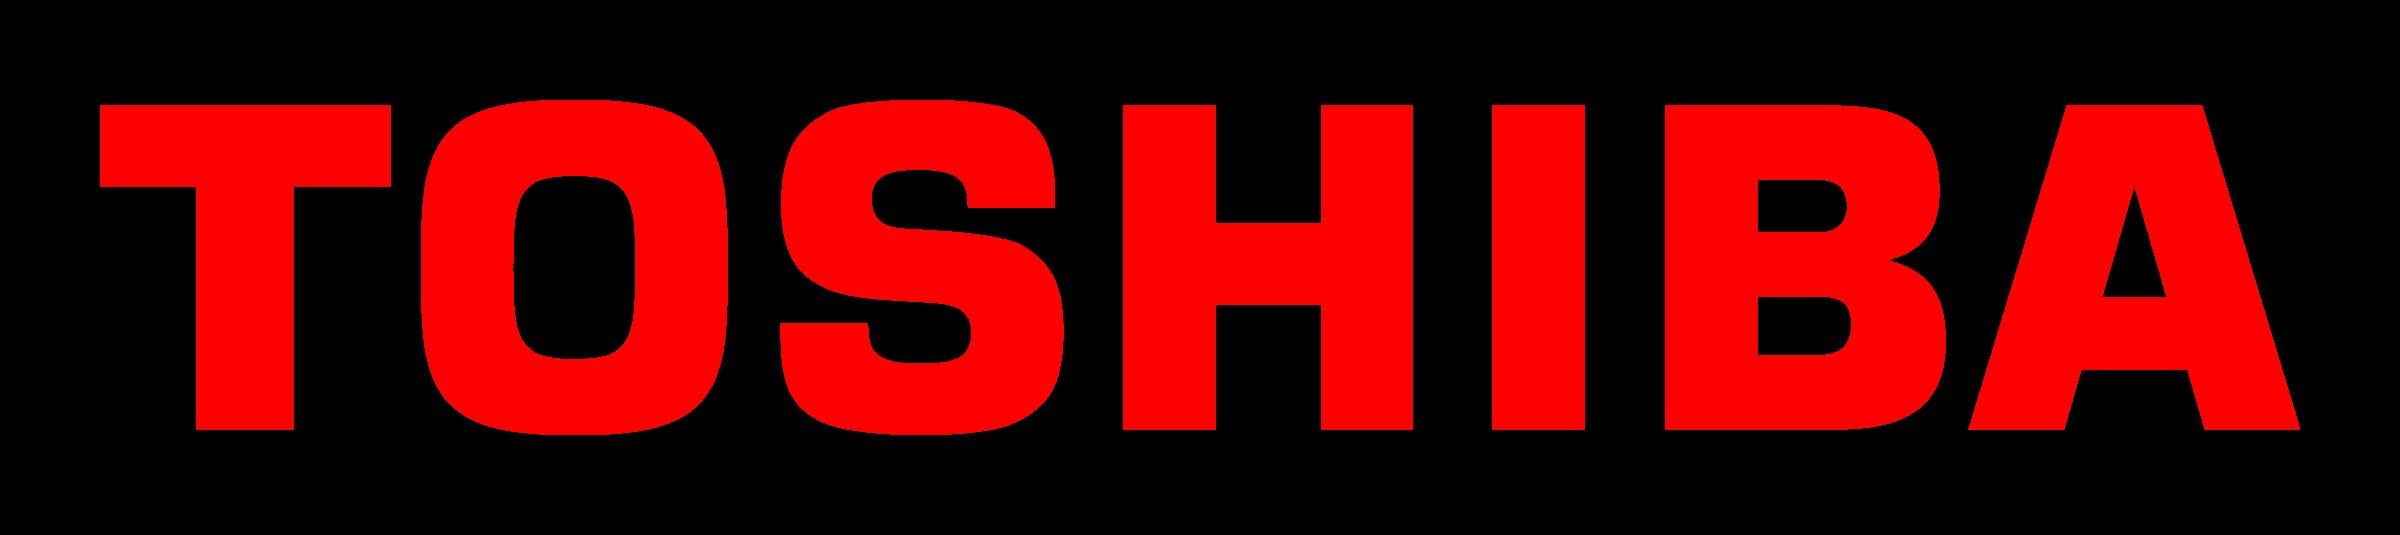 Toshiba International Corporation